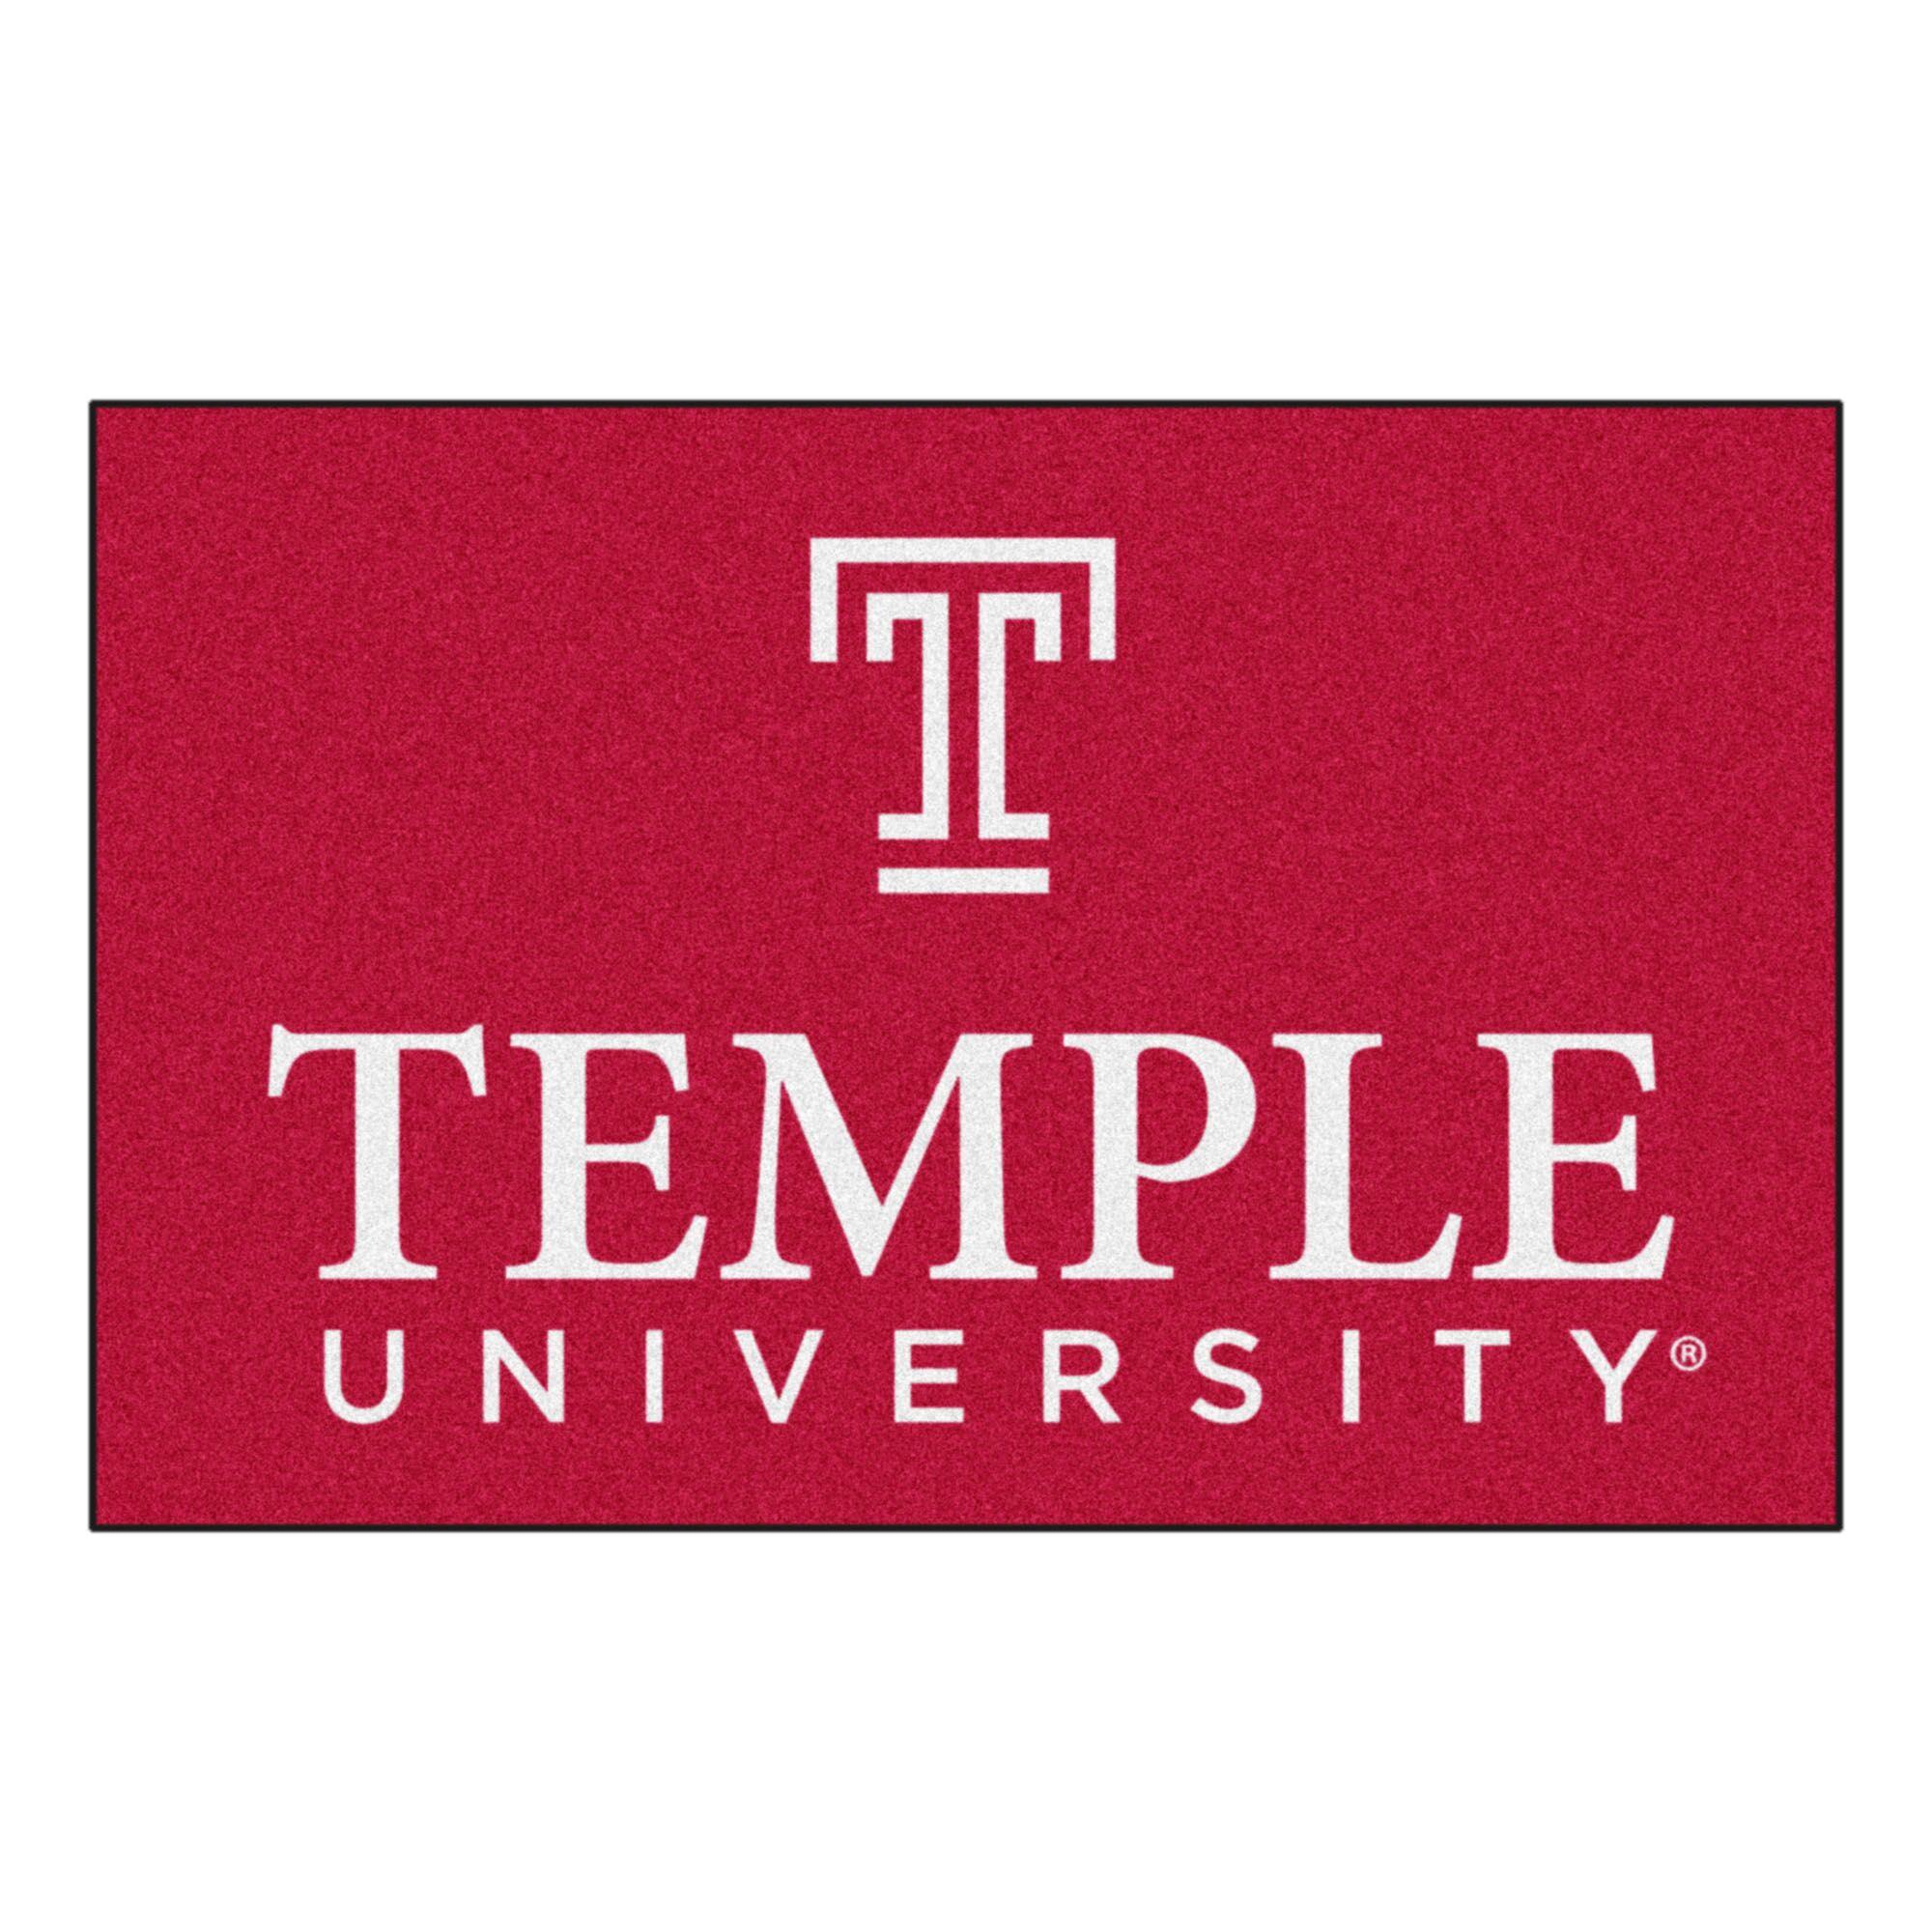 Temple University Doormat Mat Size: Rectangle 1'7